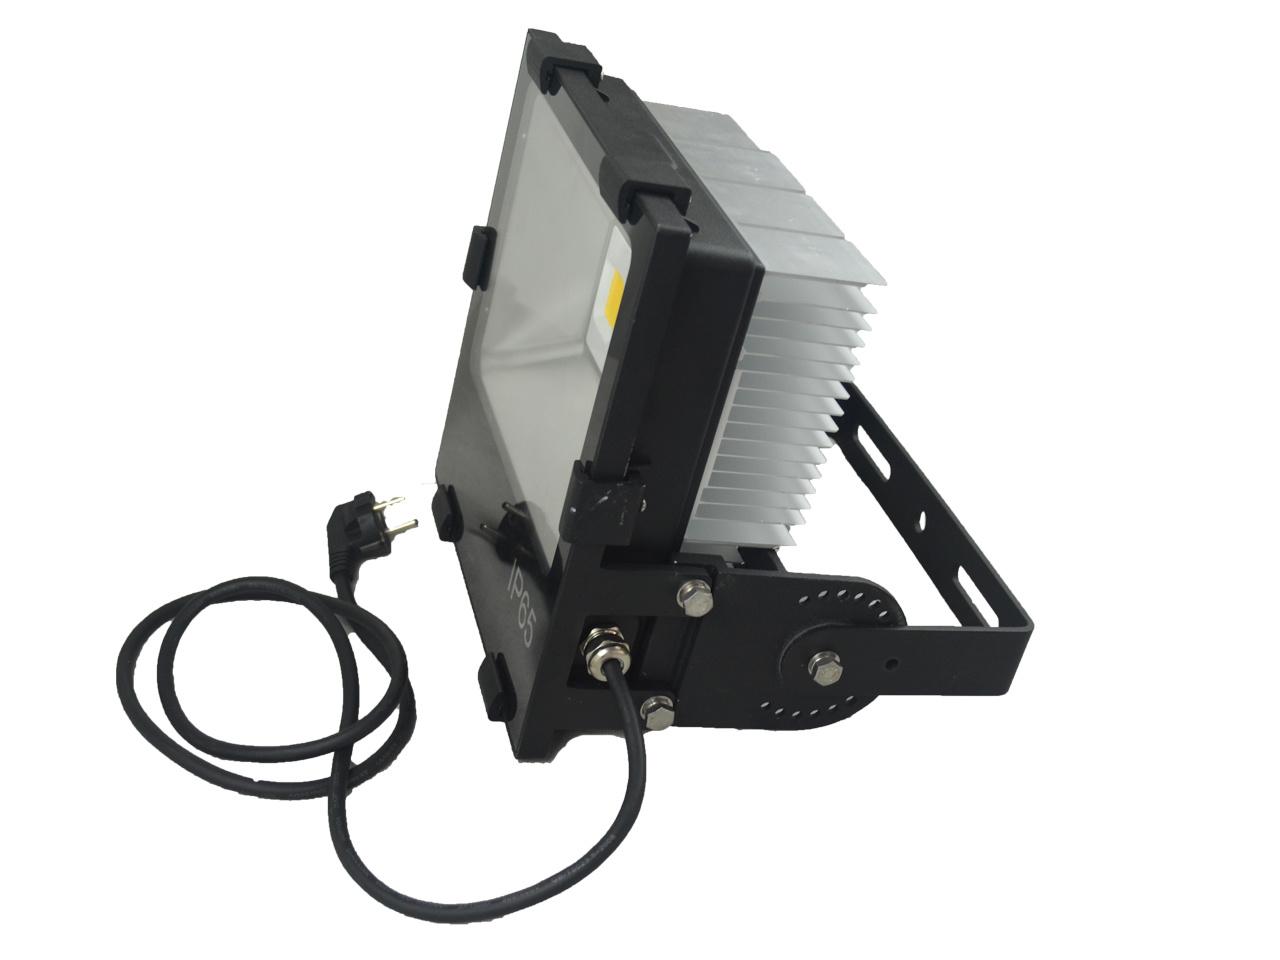 LED COB 100W Spotlights for Outdoor Garden or Building Light